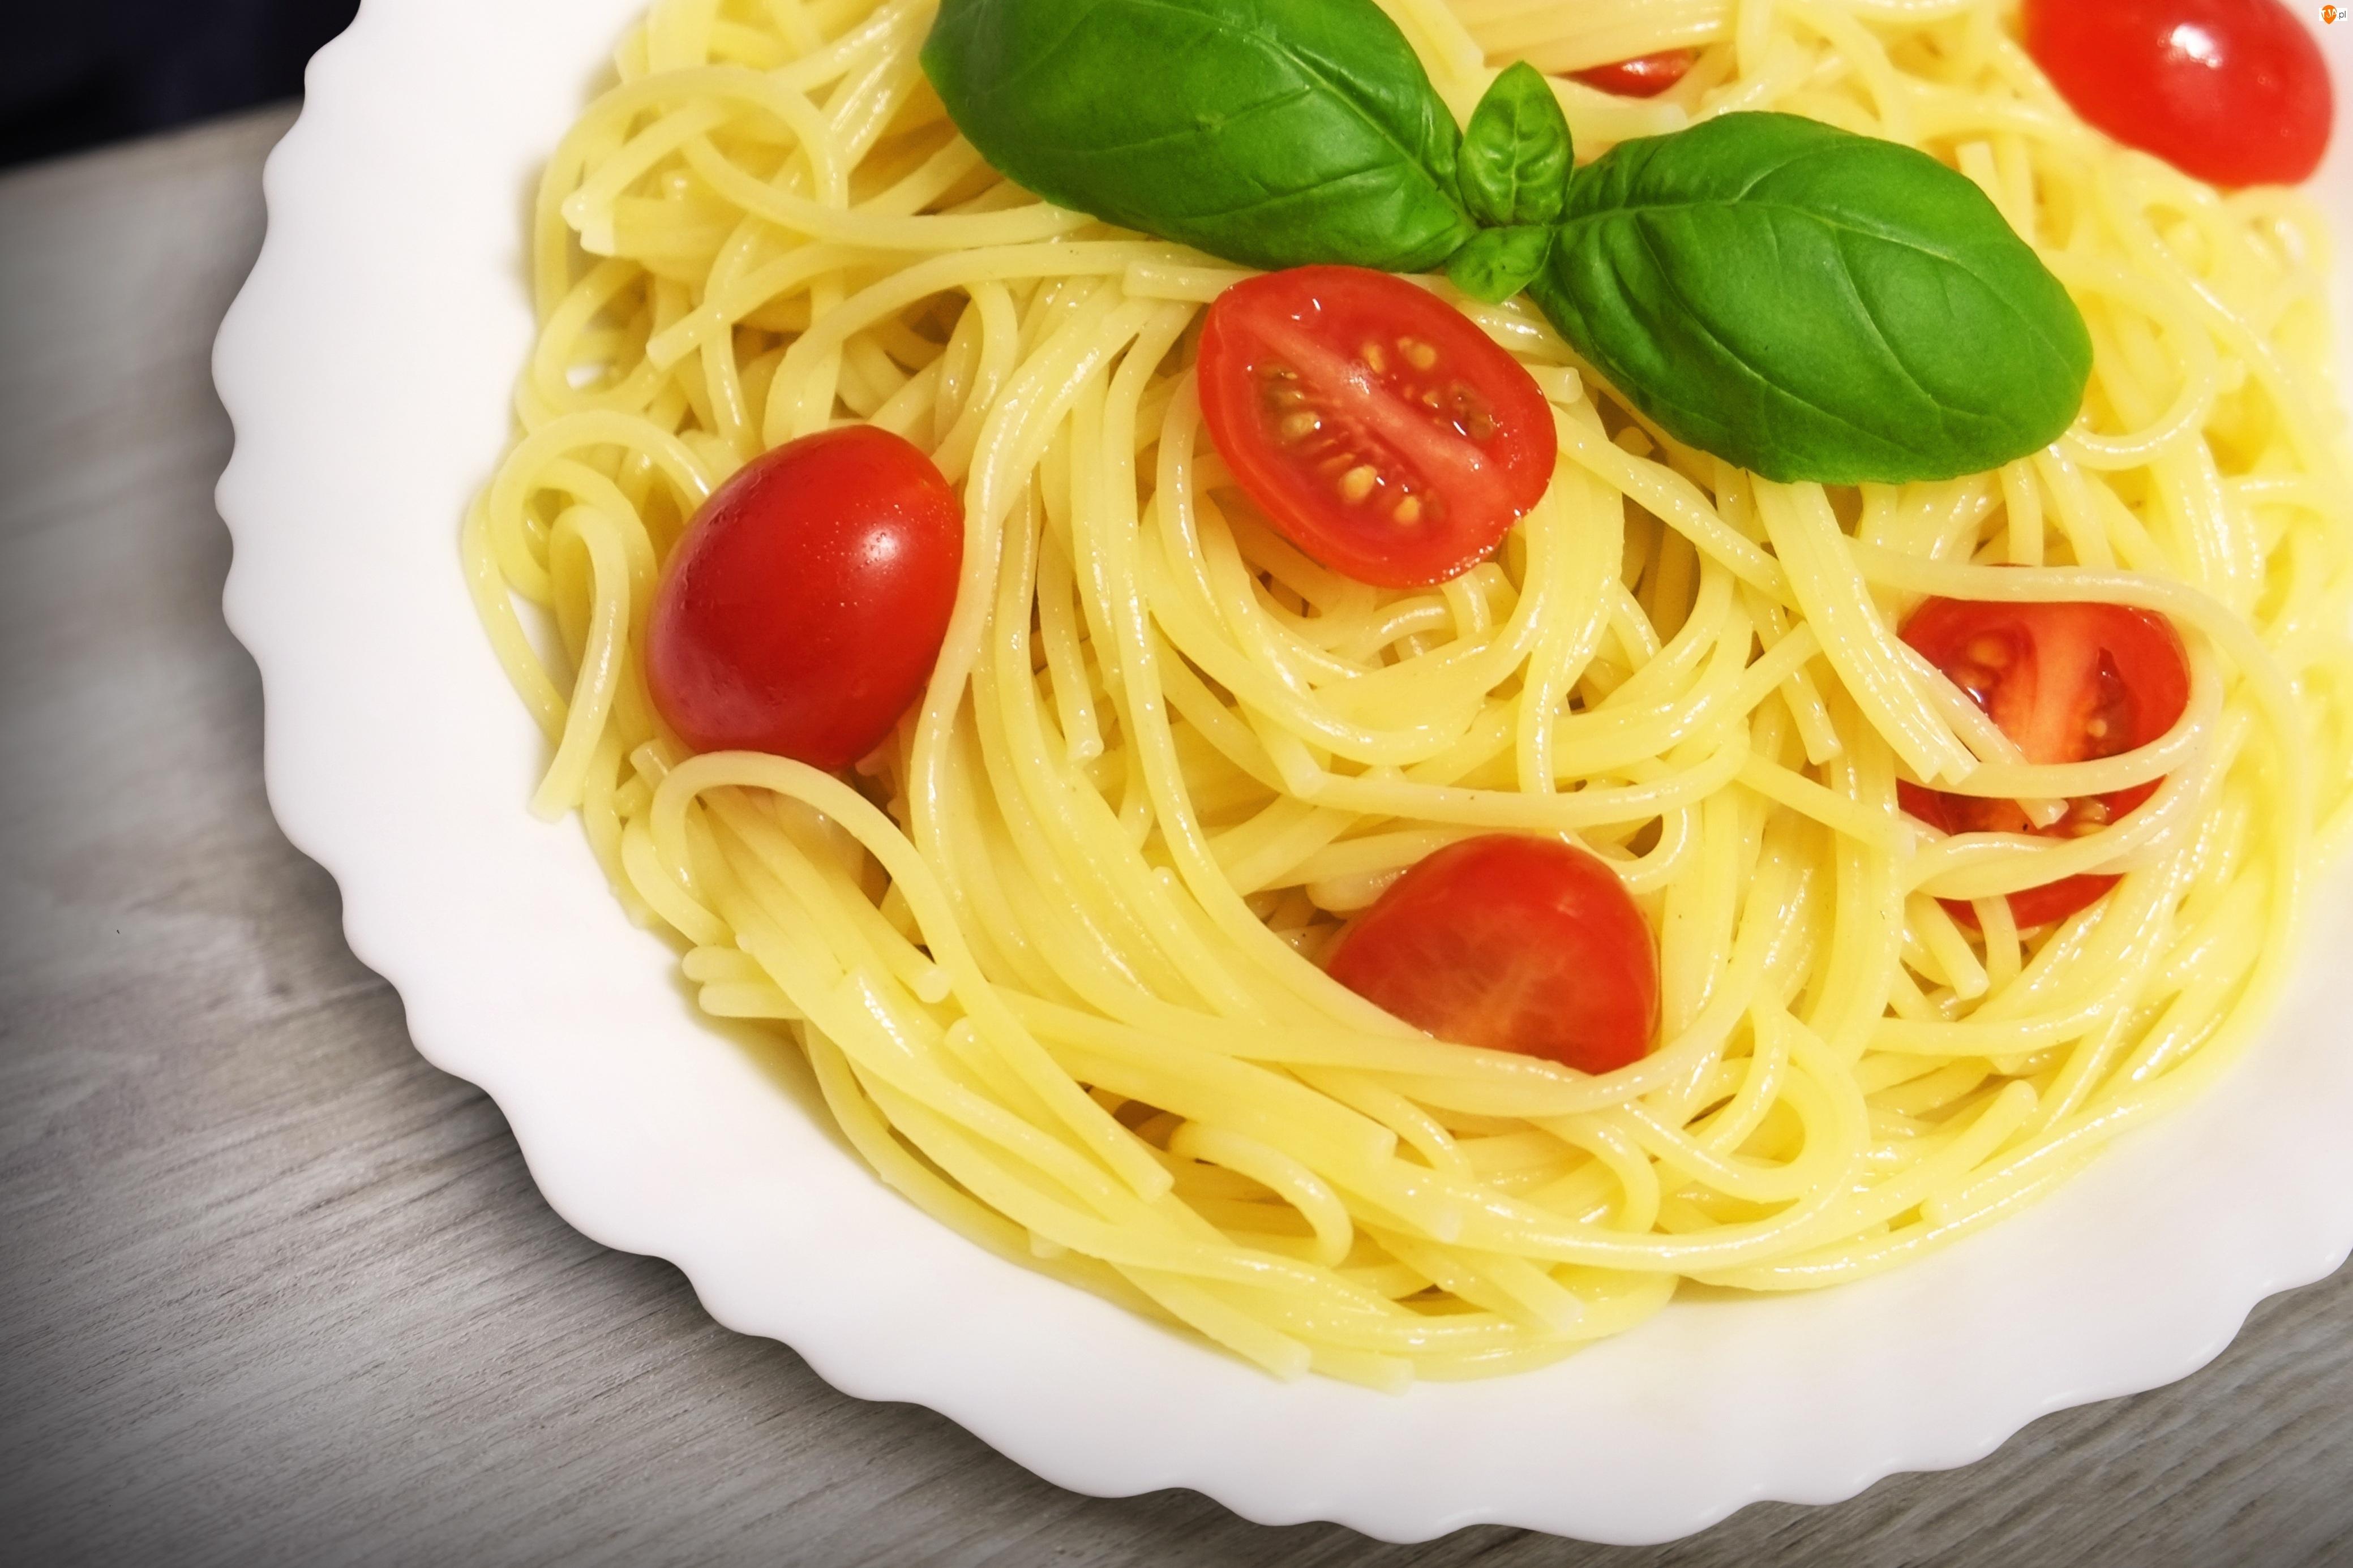 Bazylia, Spaghetti, Pomidory